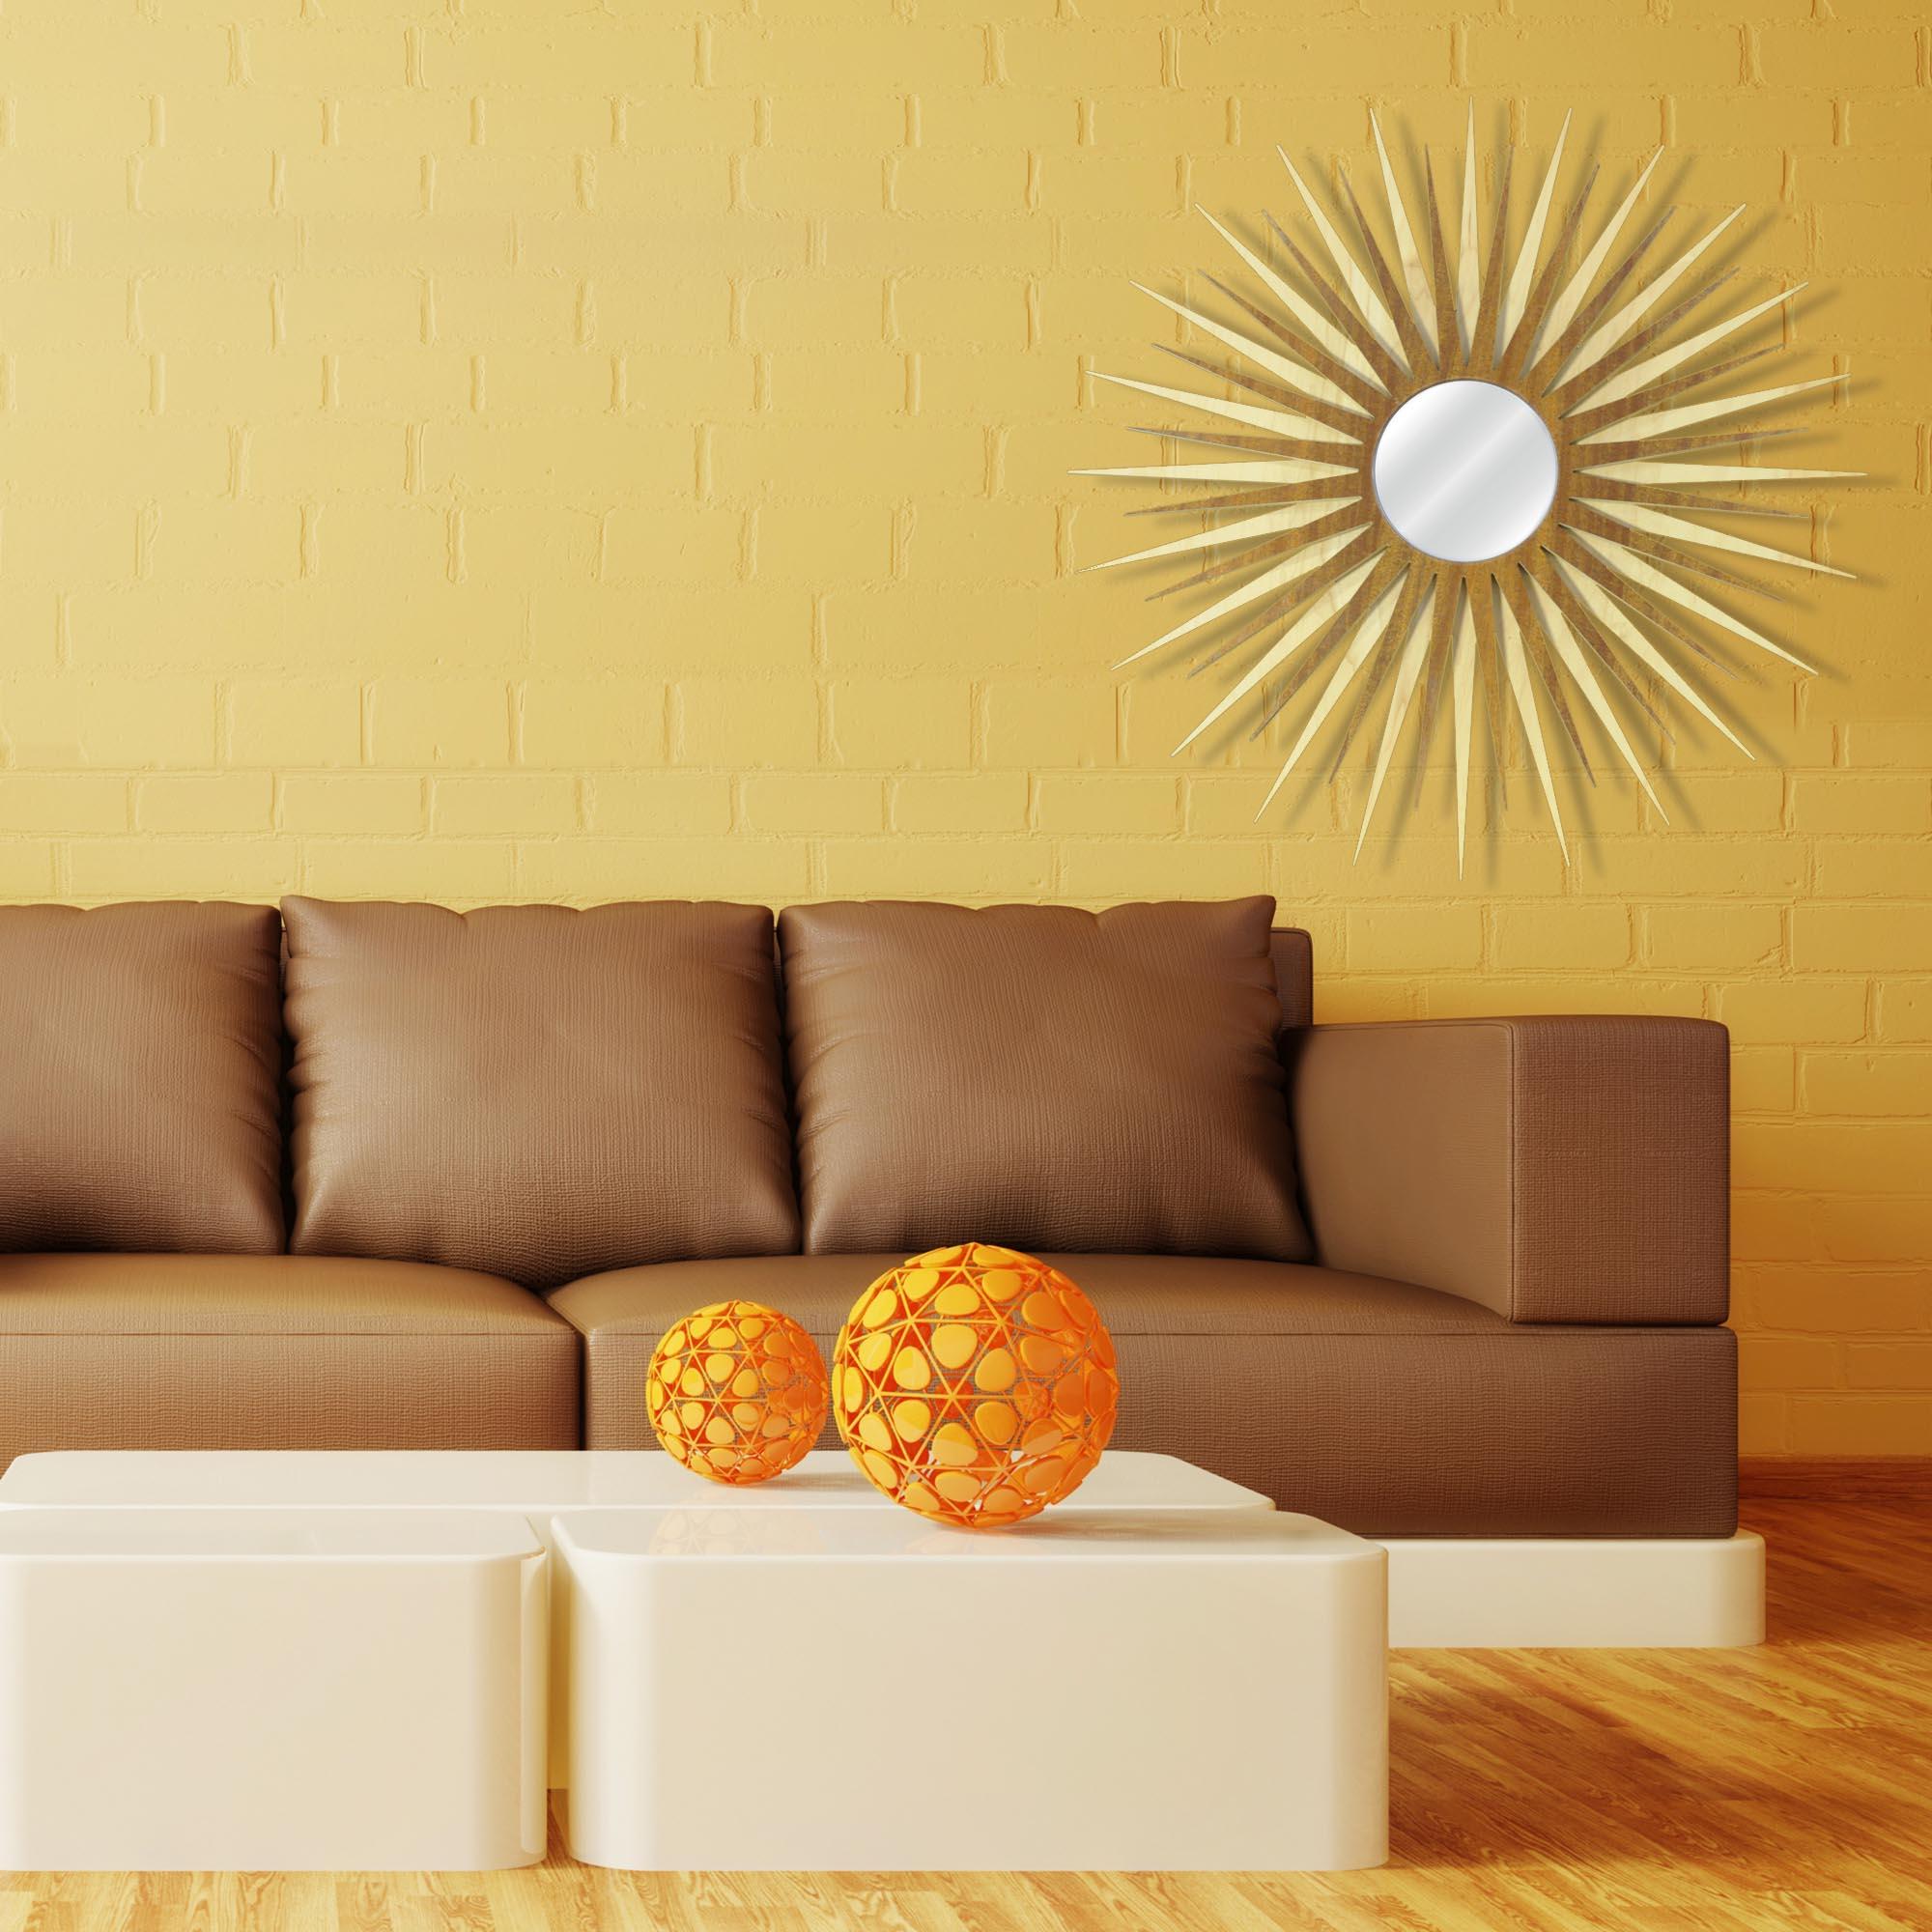 Midcentury Modern Decor 'MCM Starburst Mirror-Maple Mahogany' - Maple/Mahogany Plywood Wooden Sunburst Mirror - Lifestyle View